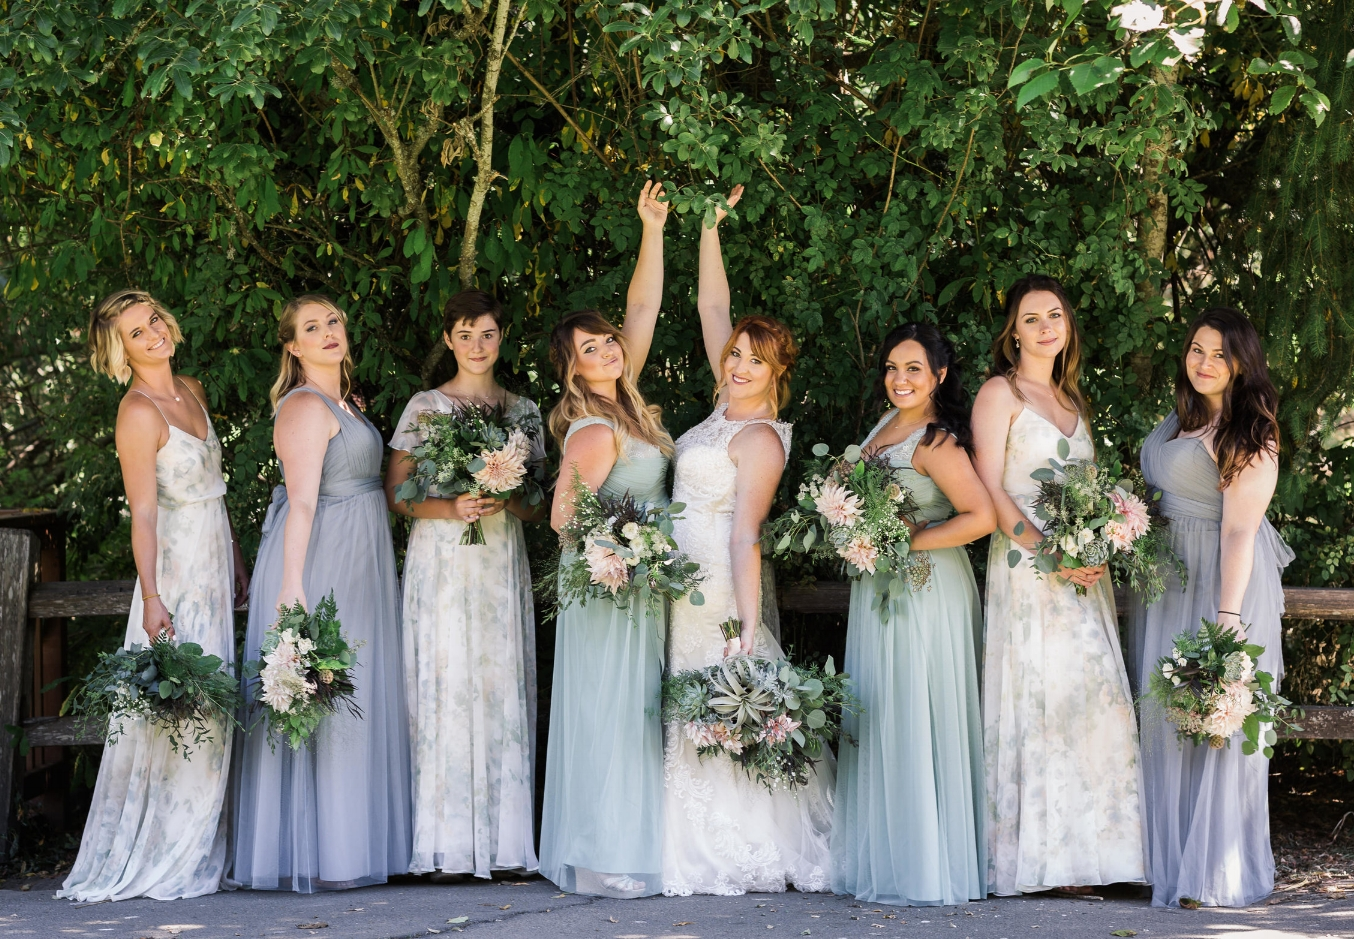 Dahlia & succulent bouquets-Amy Galbraith Photography